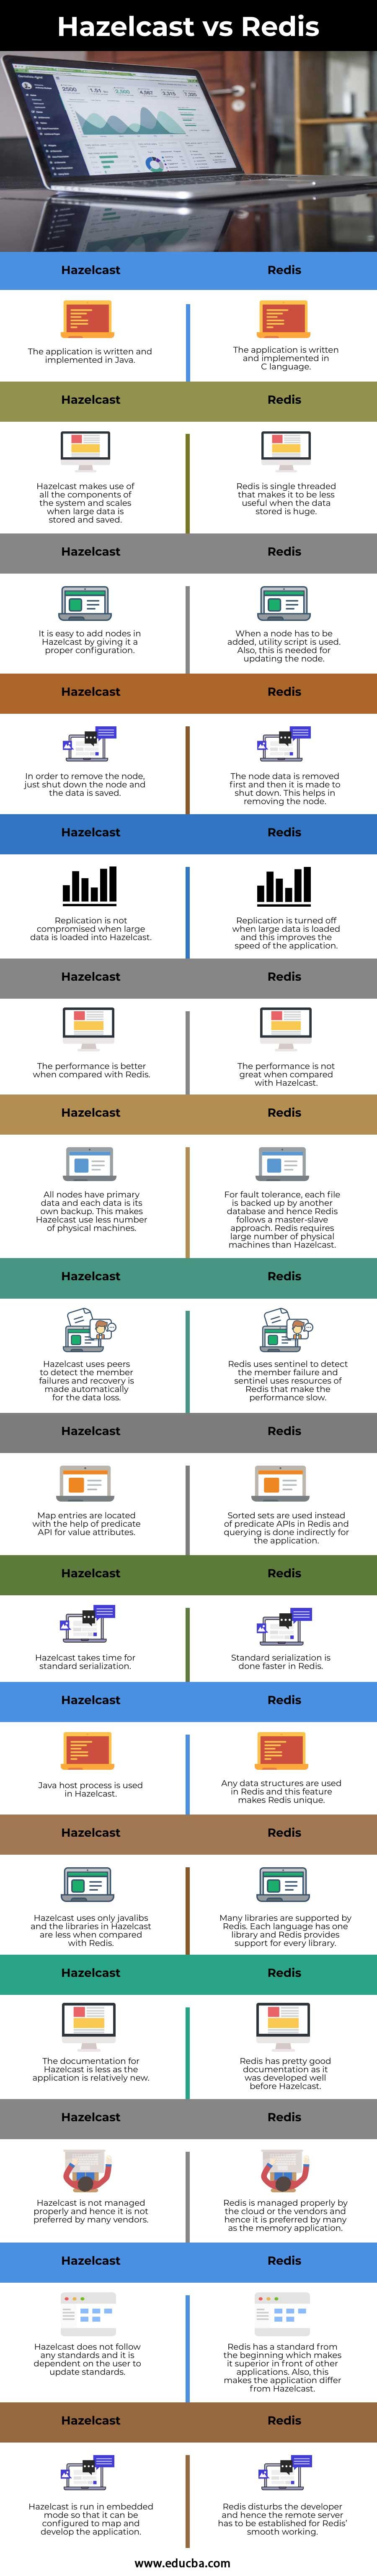 Hazelcast-vs-Redis-info